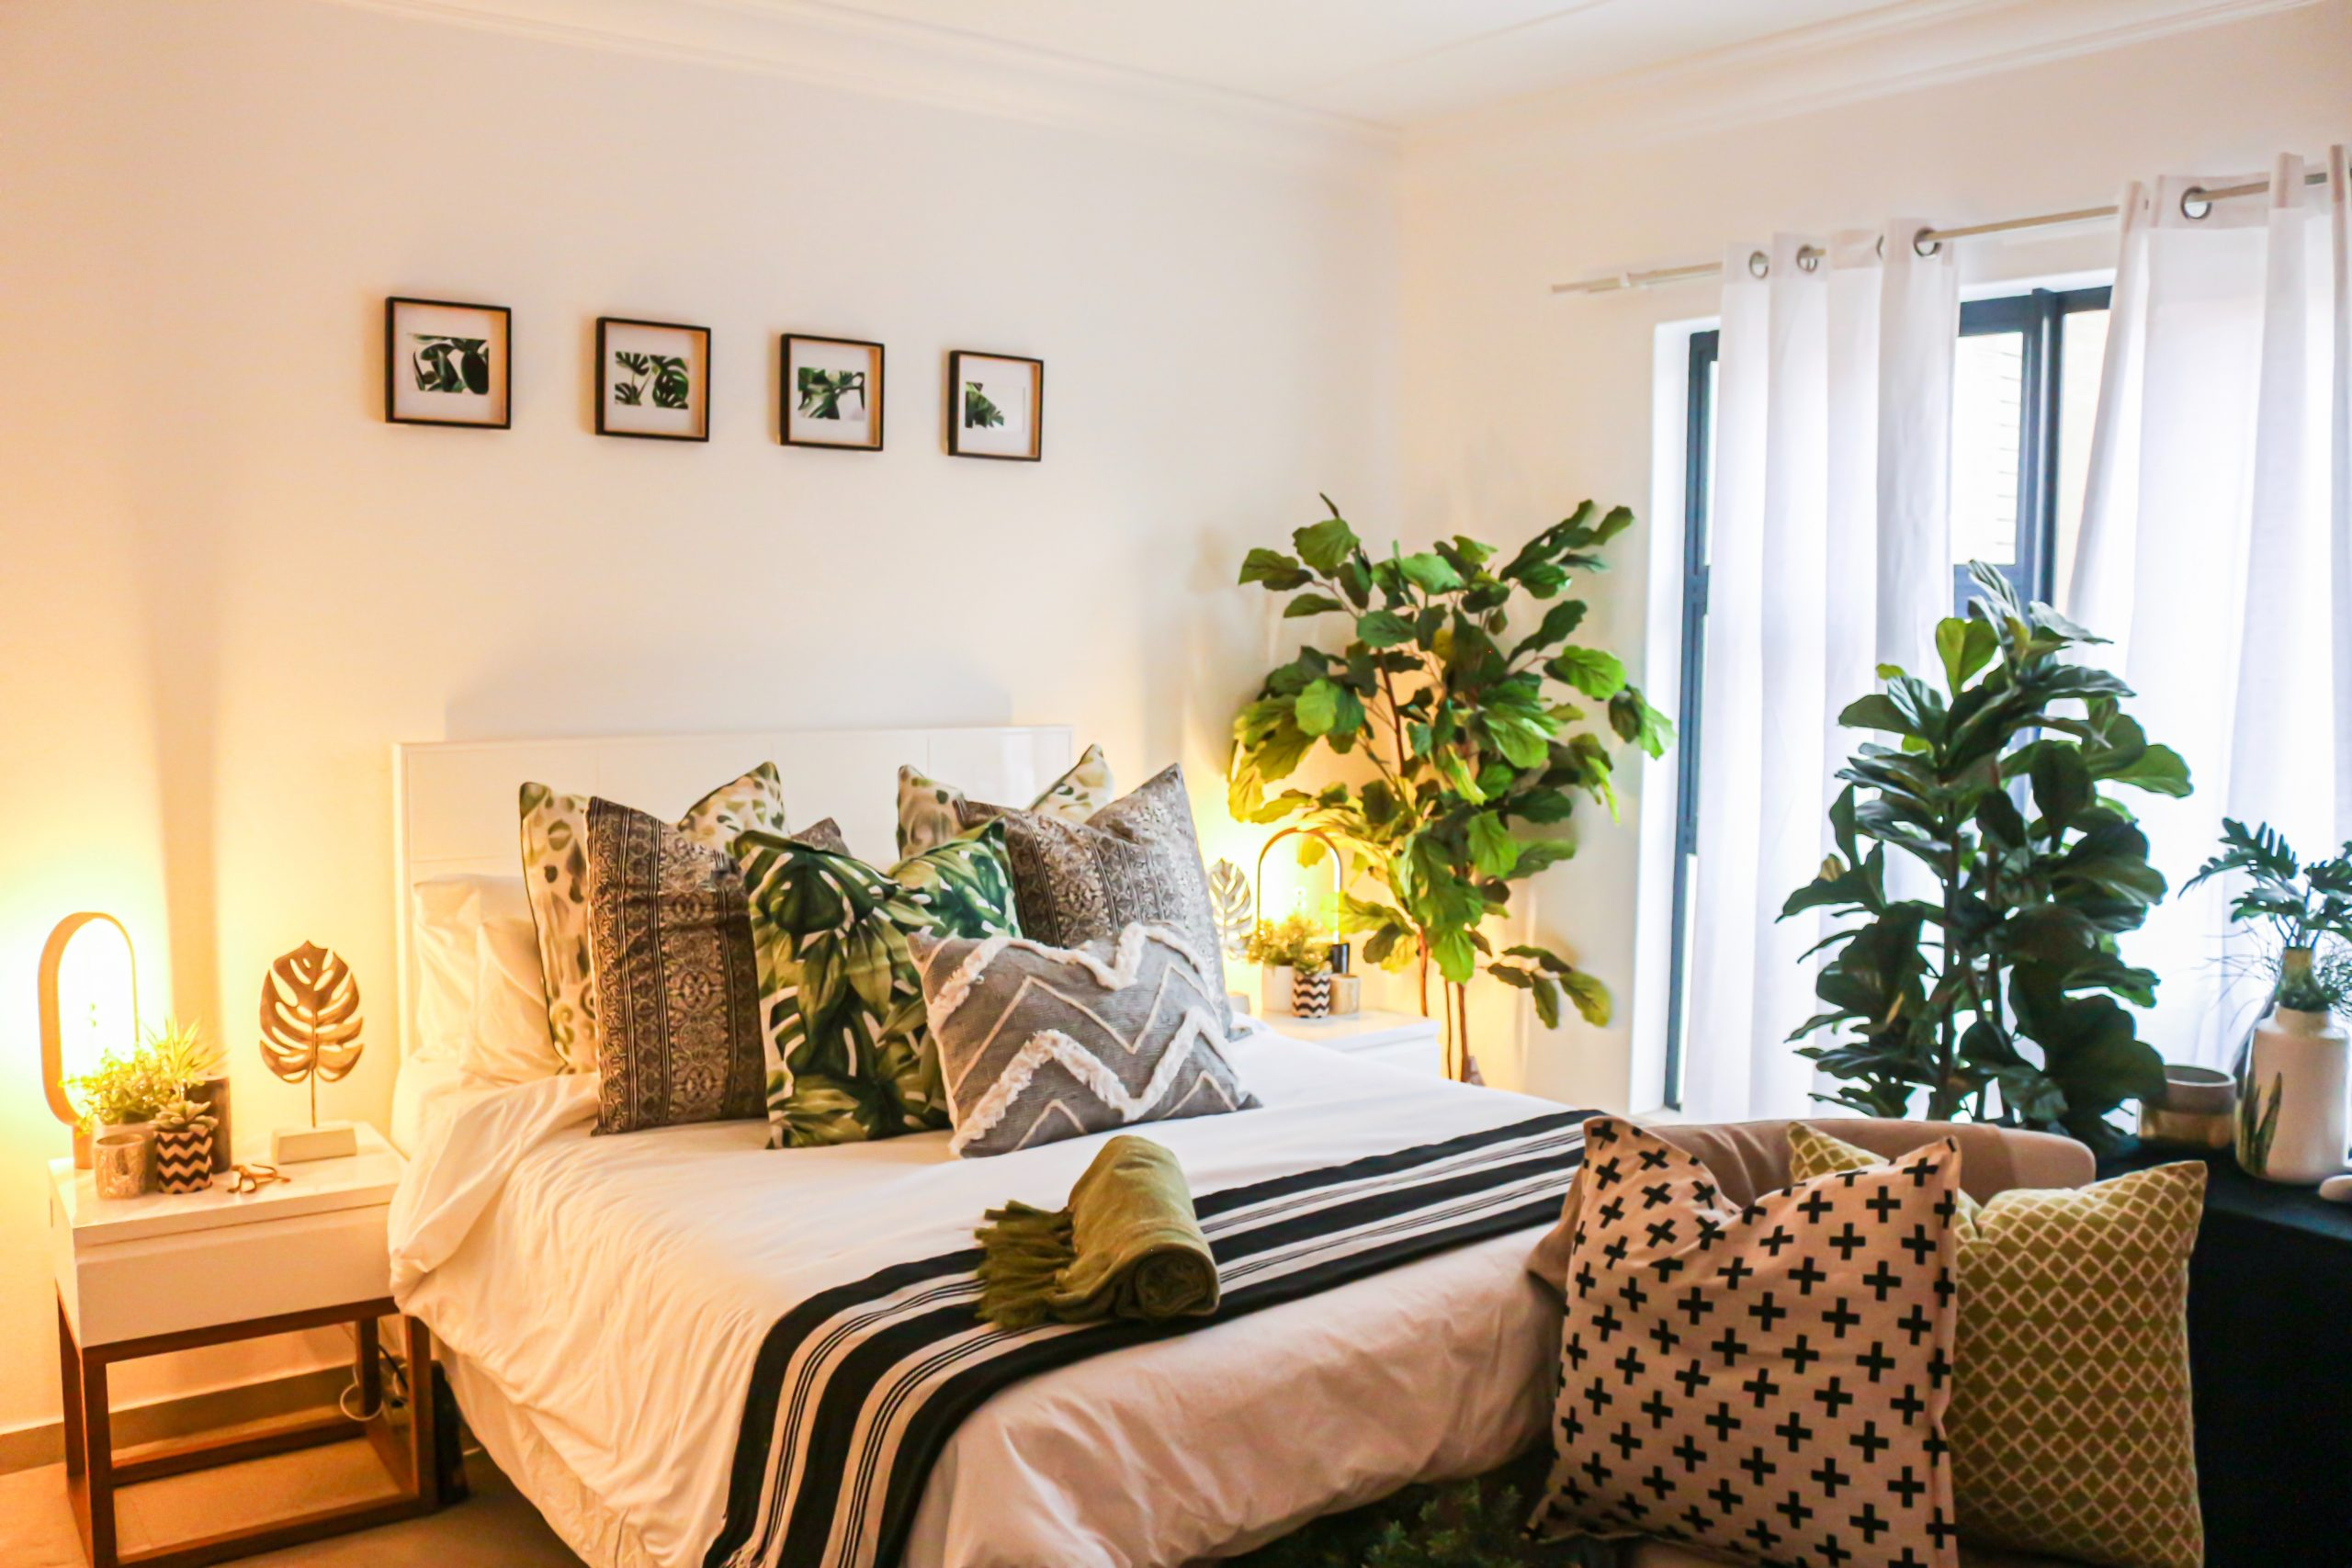 Nettoyage de printemps : organiser et ranger sa chambre